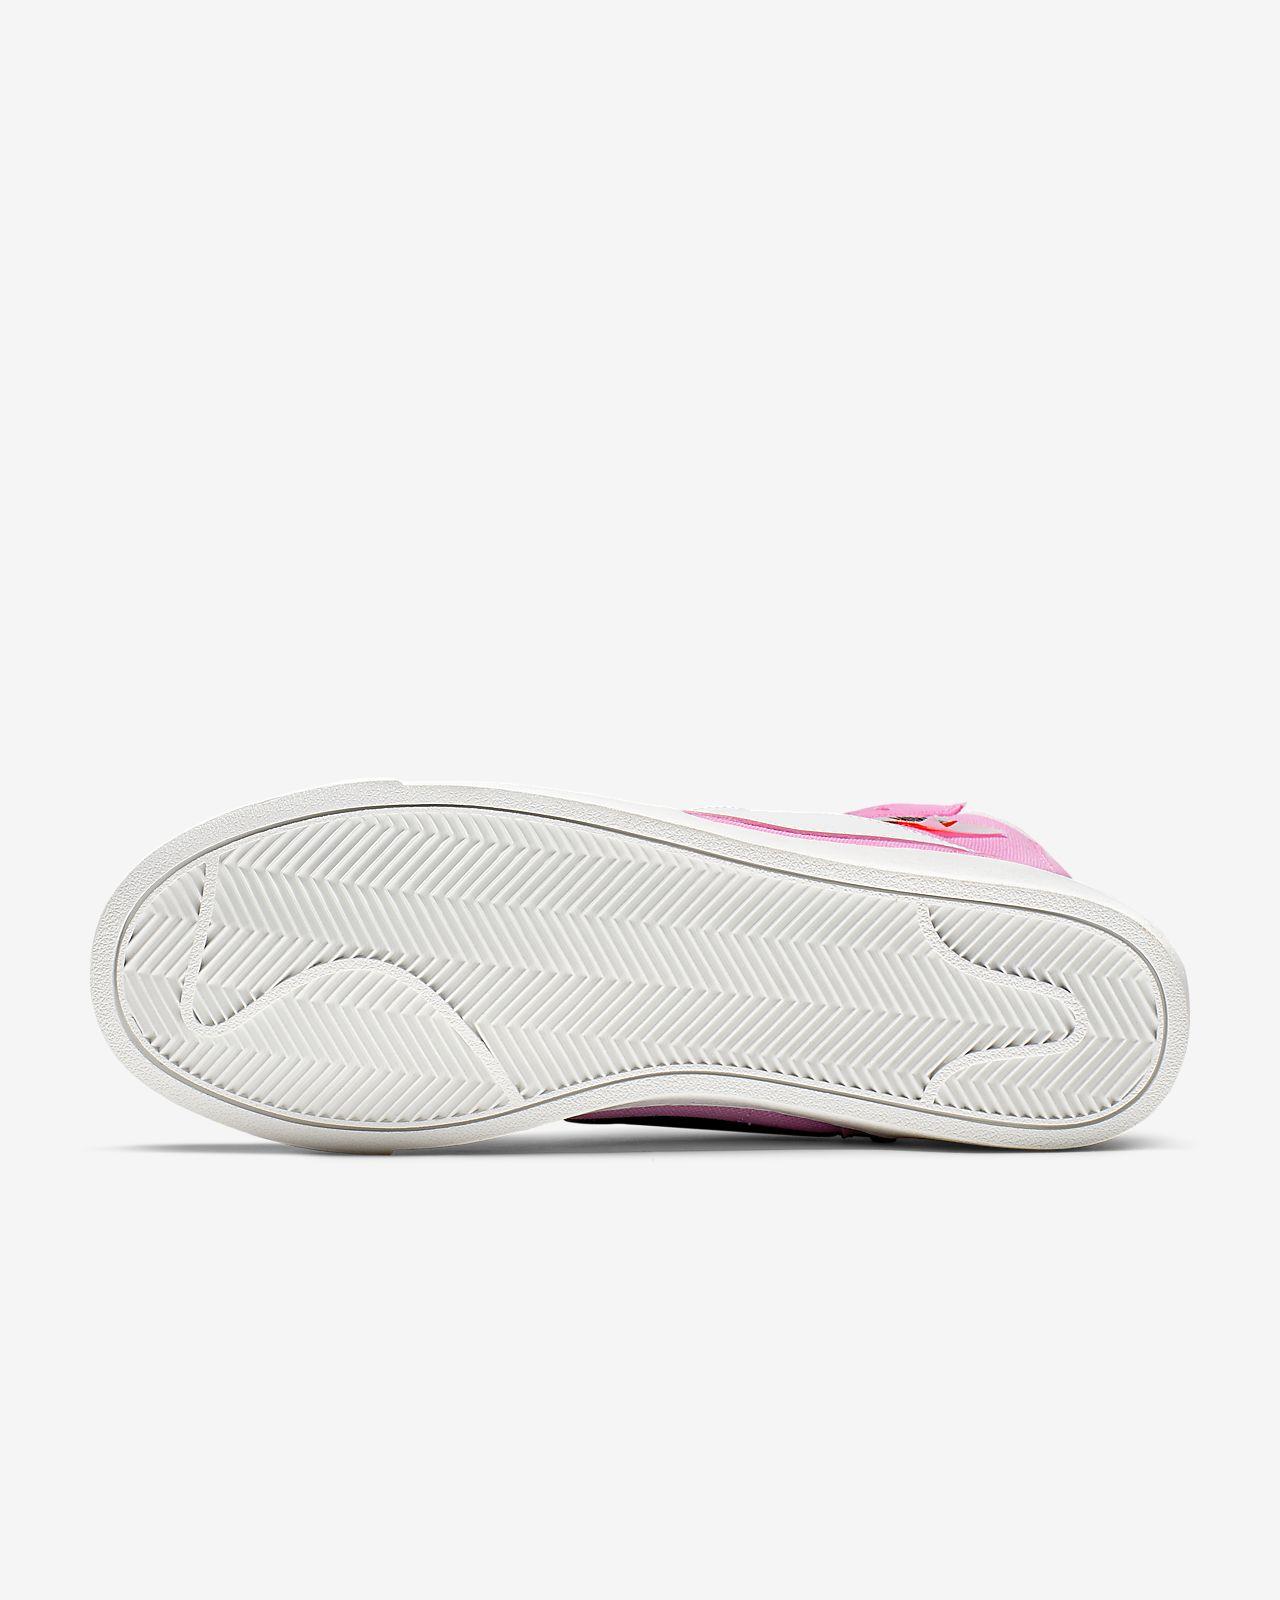 info for 72db7 0c7a7 ... Nike Blazer Mid Rebel Women s Shoe